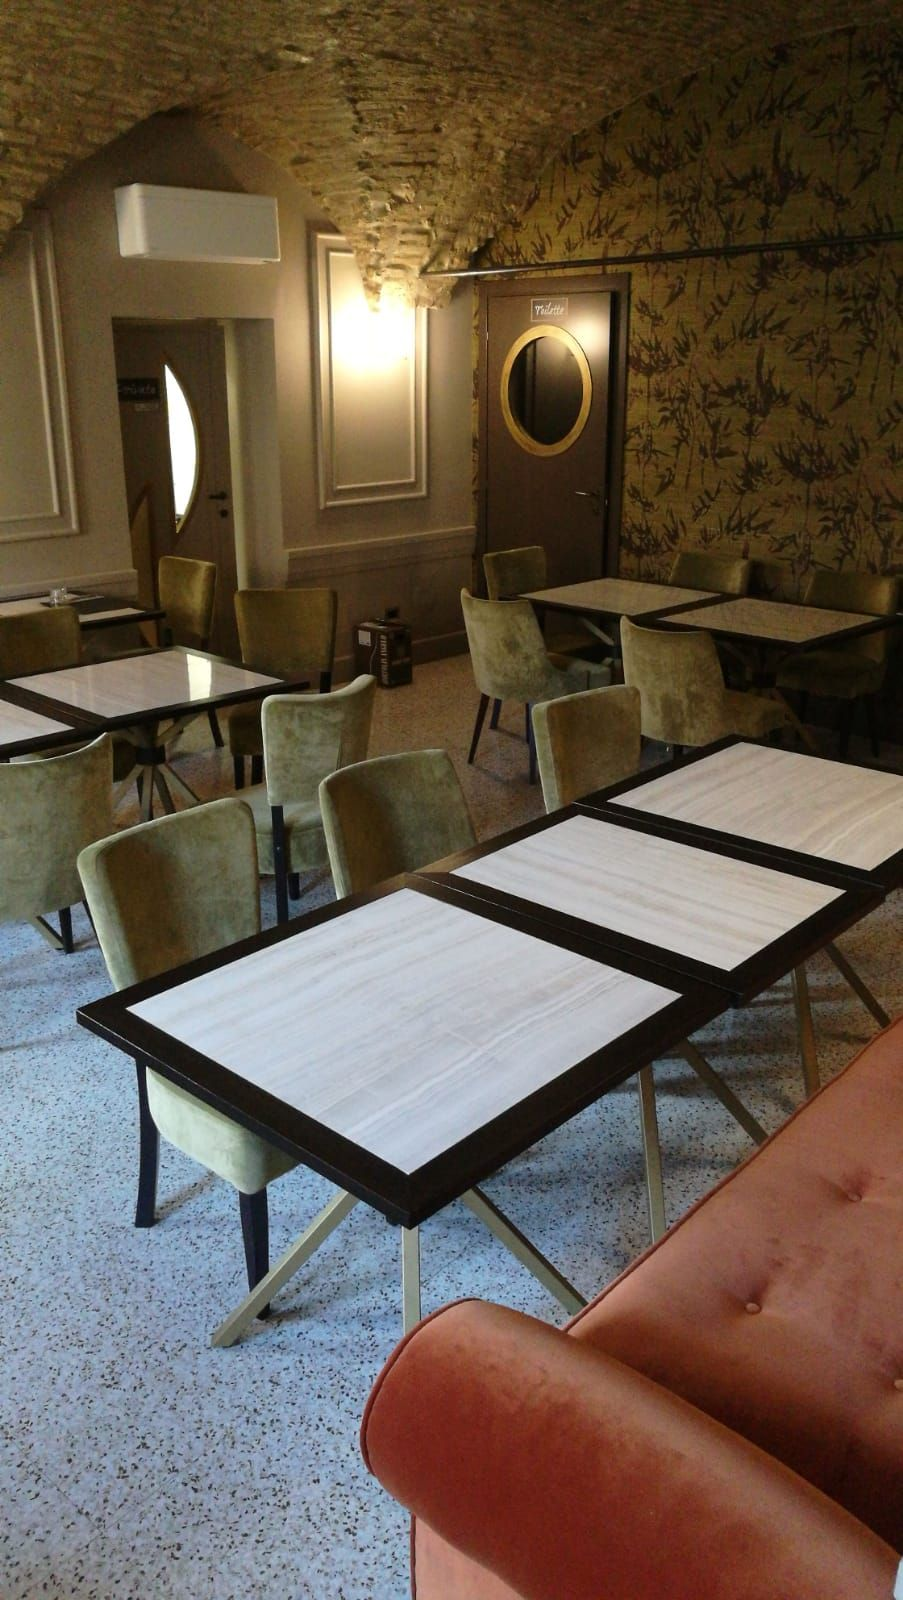 franchi sedie calderara catalogo tavoli birreria